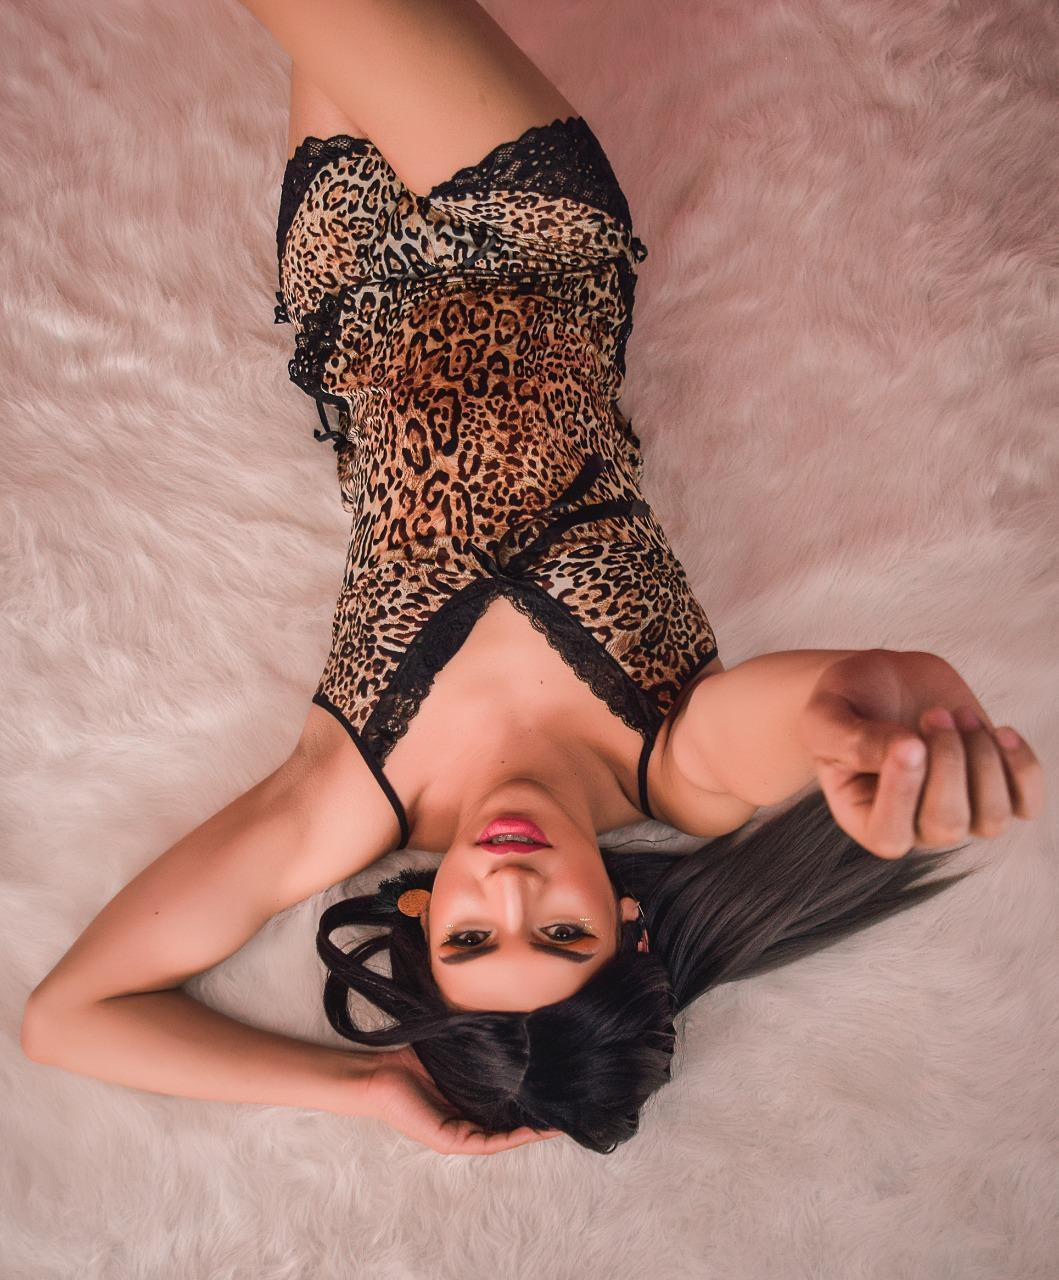 Geisha naughty?s=+rnseijckyljov+rvc6wjha+m34o+169blfvqwj7030=